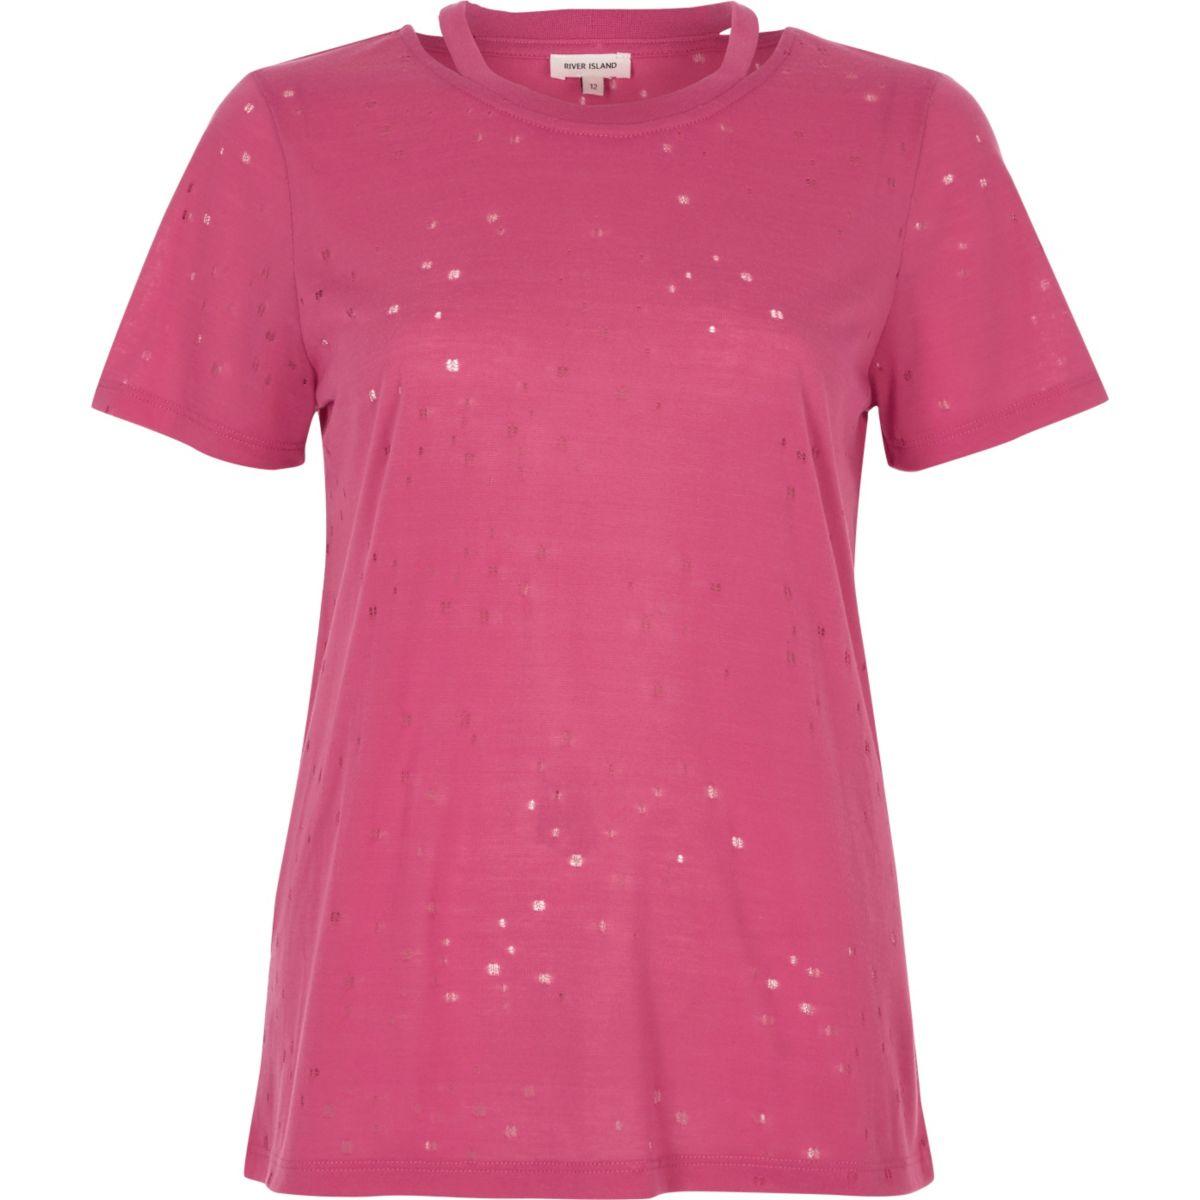 Pink distressed T-shirt